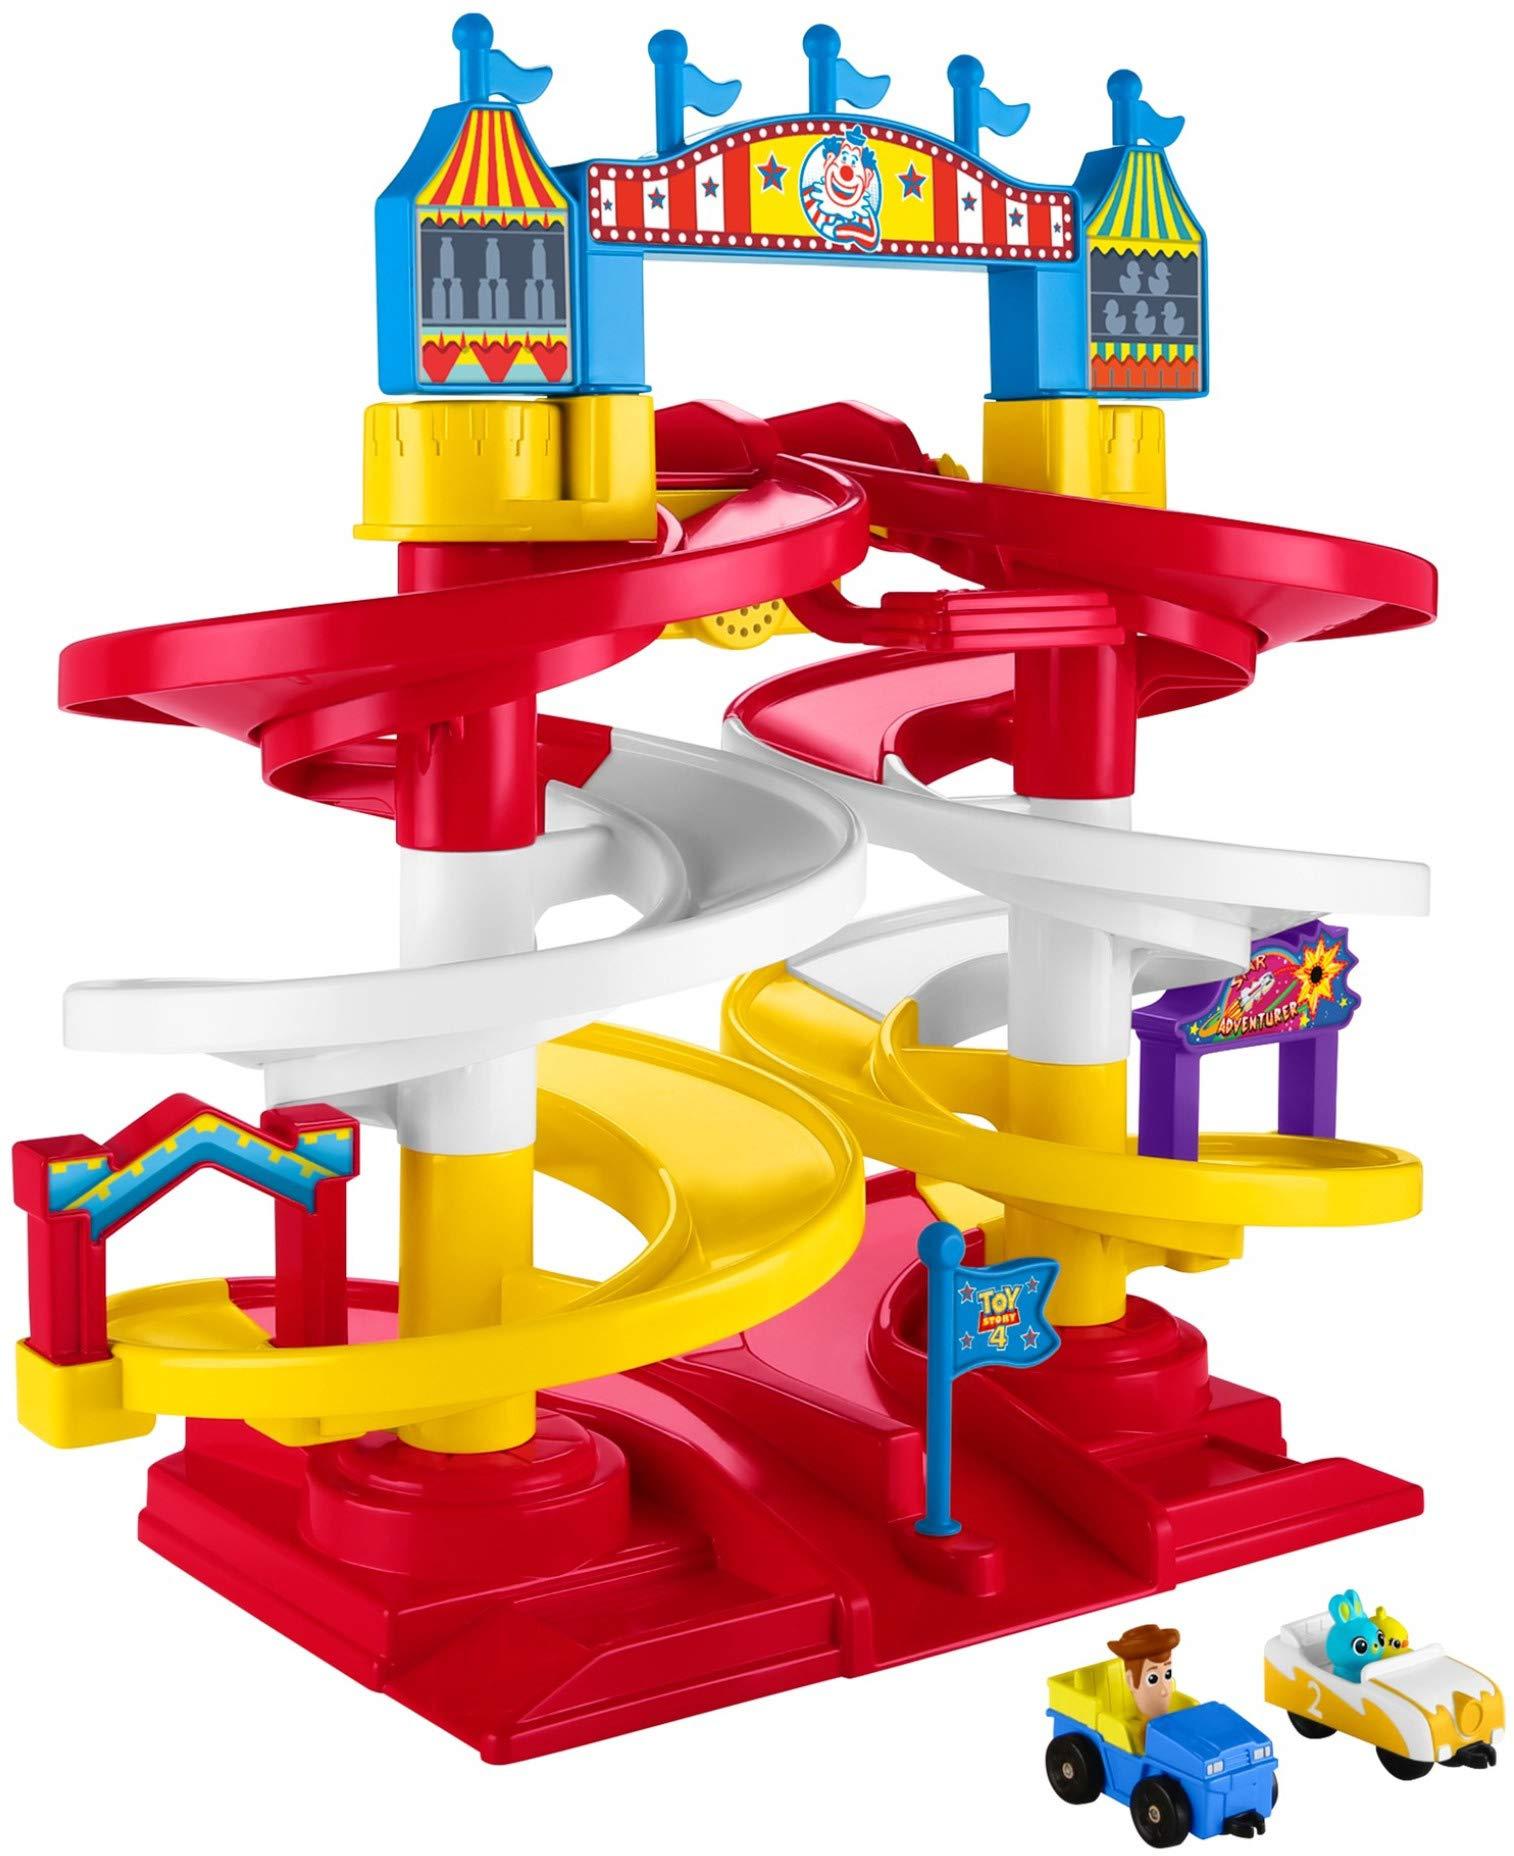 Fisher-Price Disney/Pixar Toy Story 3 Big Spiral Speedway